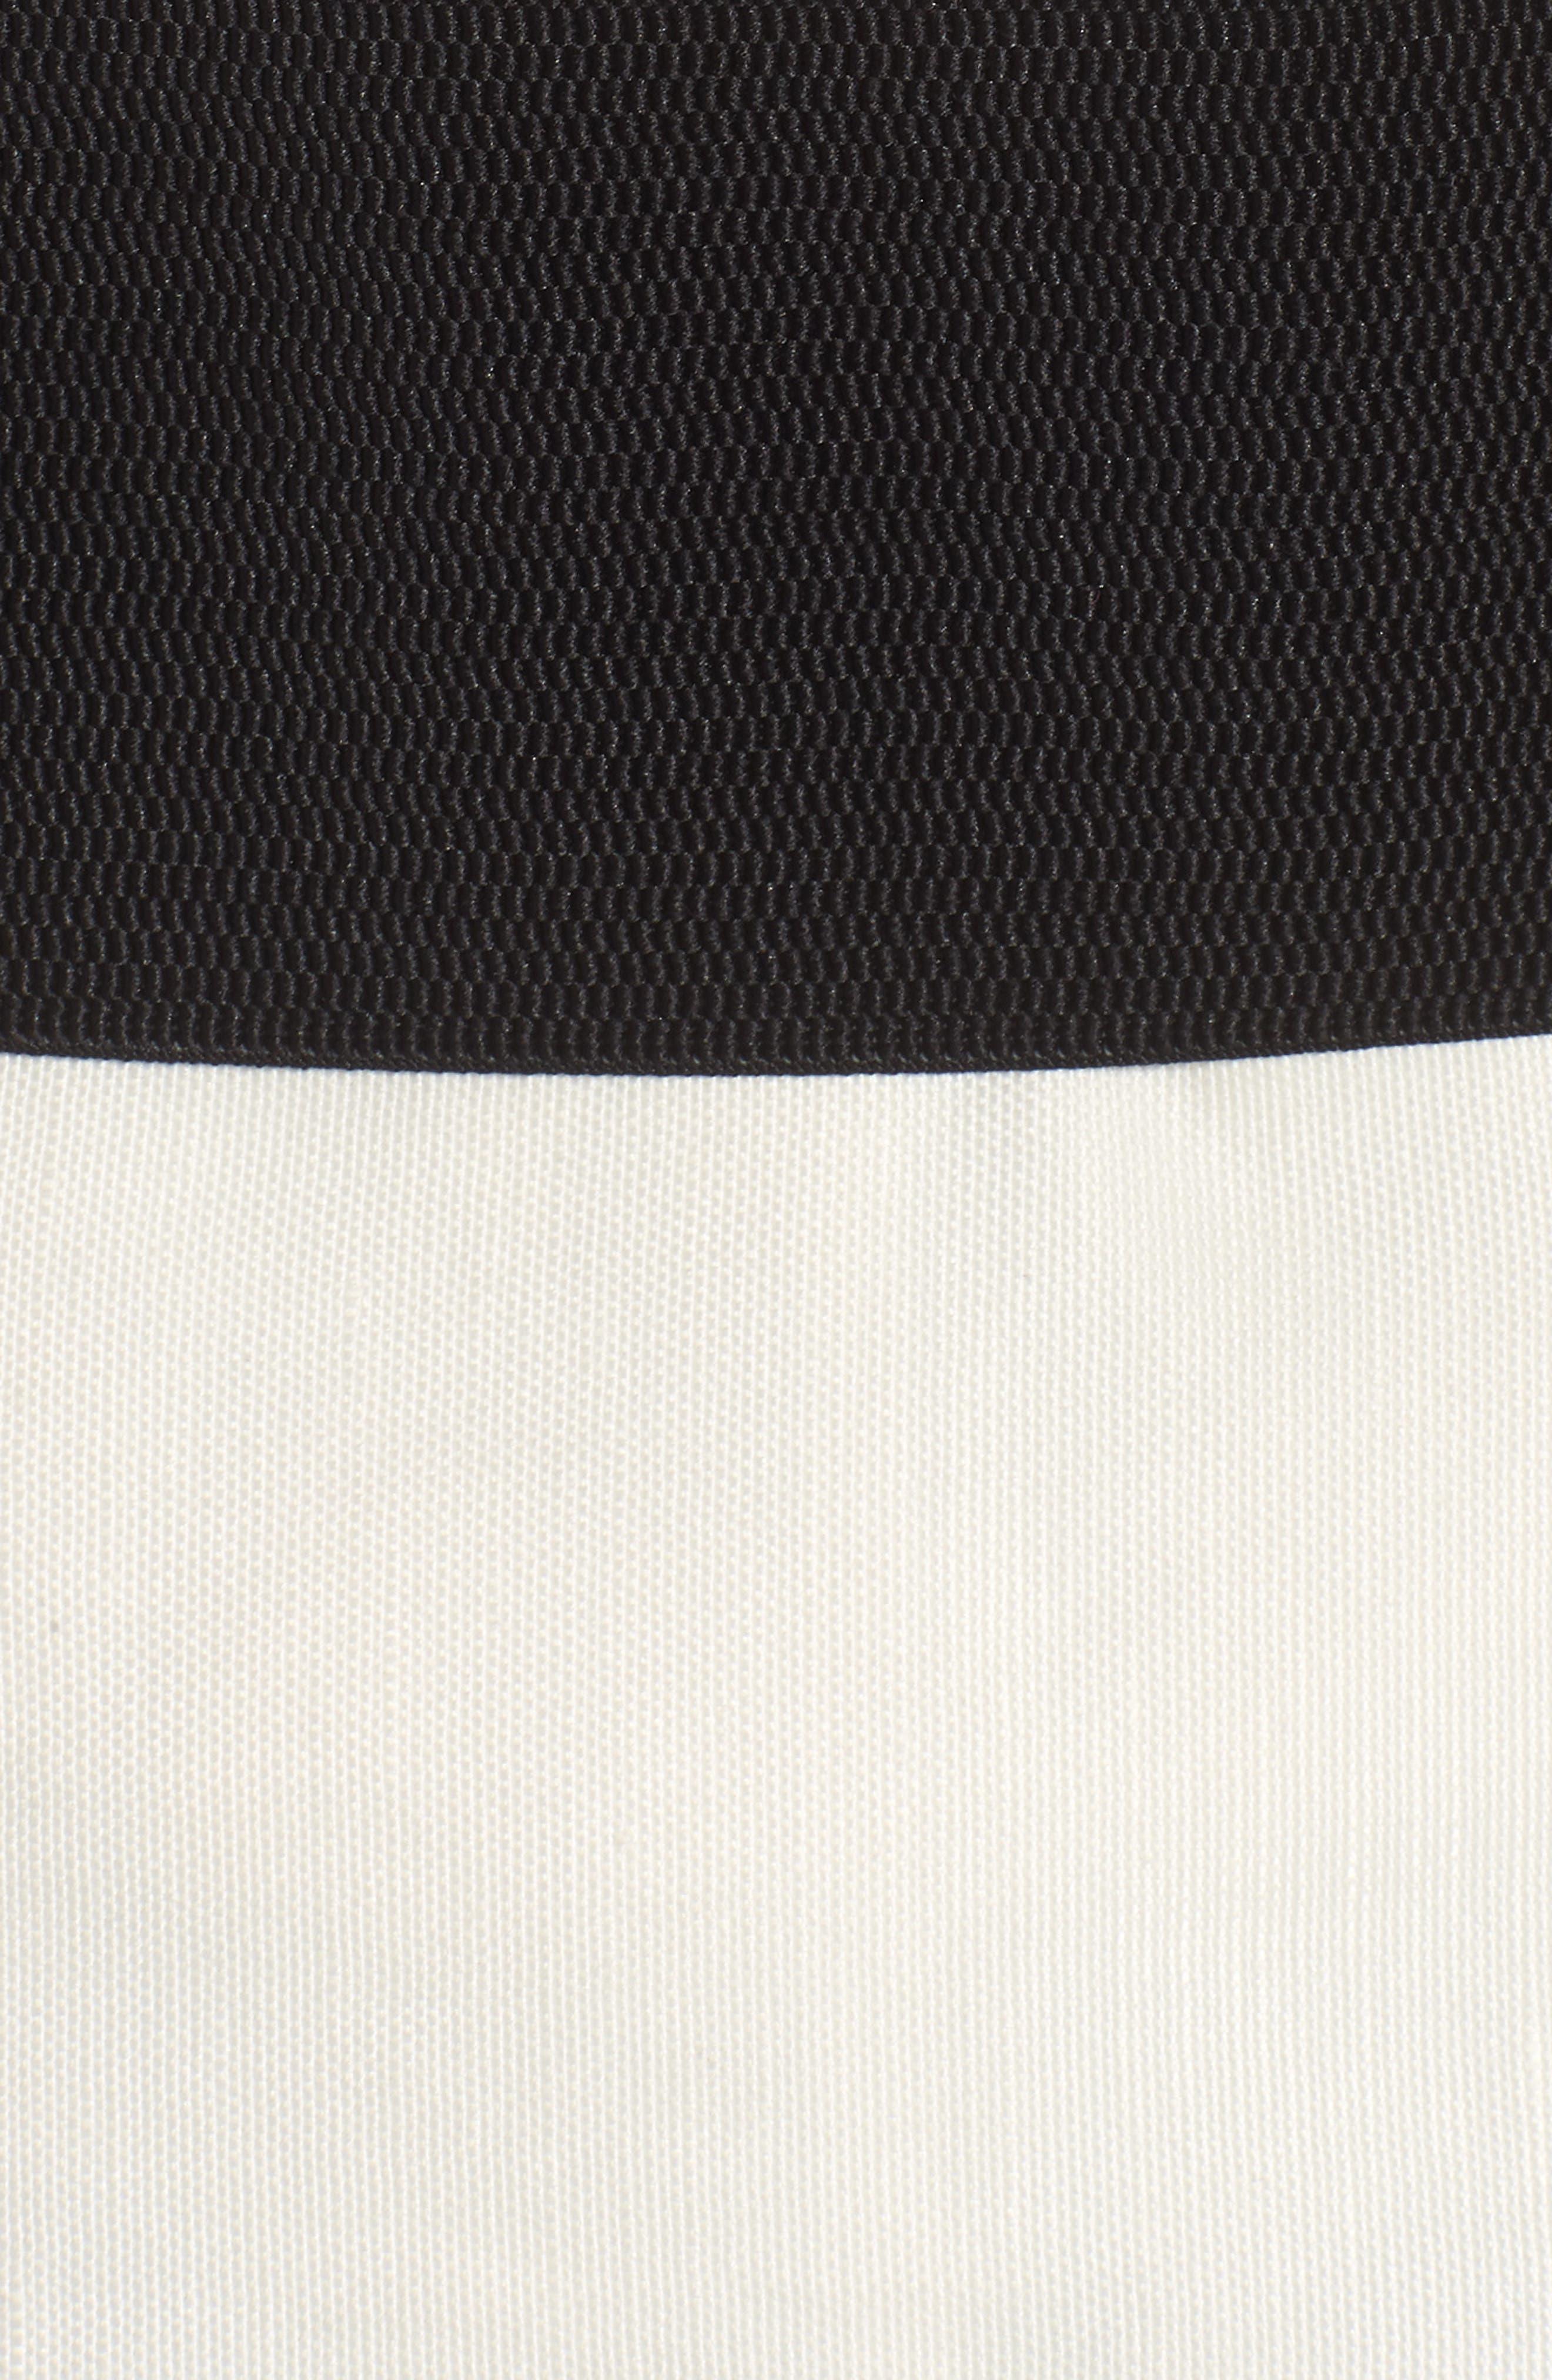 Corset Linen Blend Blazer,                             Alternate thumbnail 5, color,                             Ivory